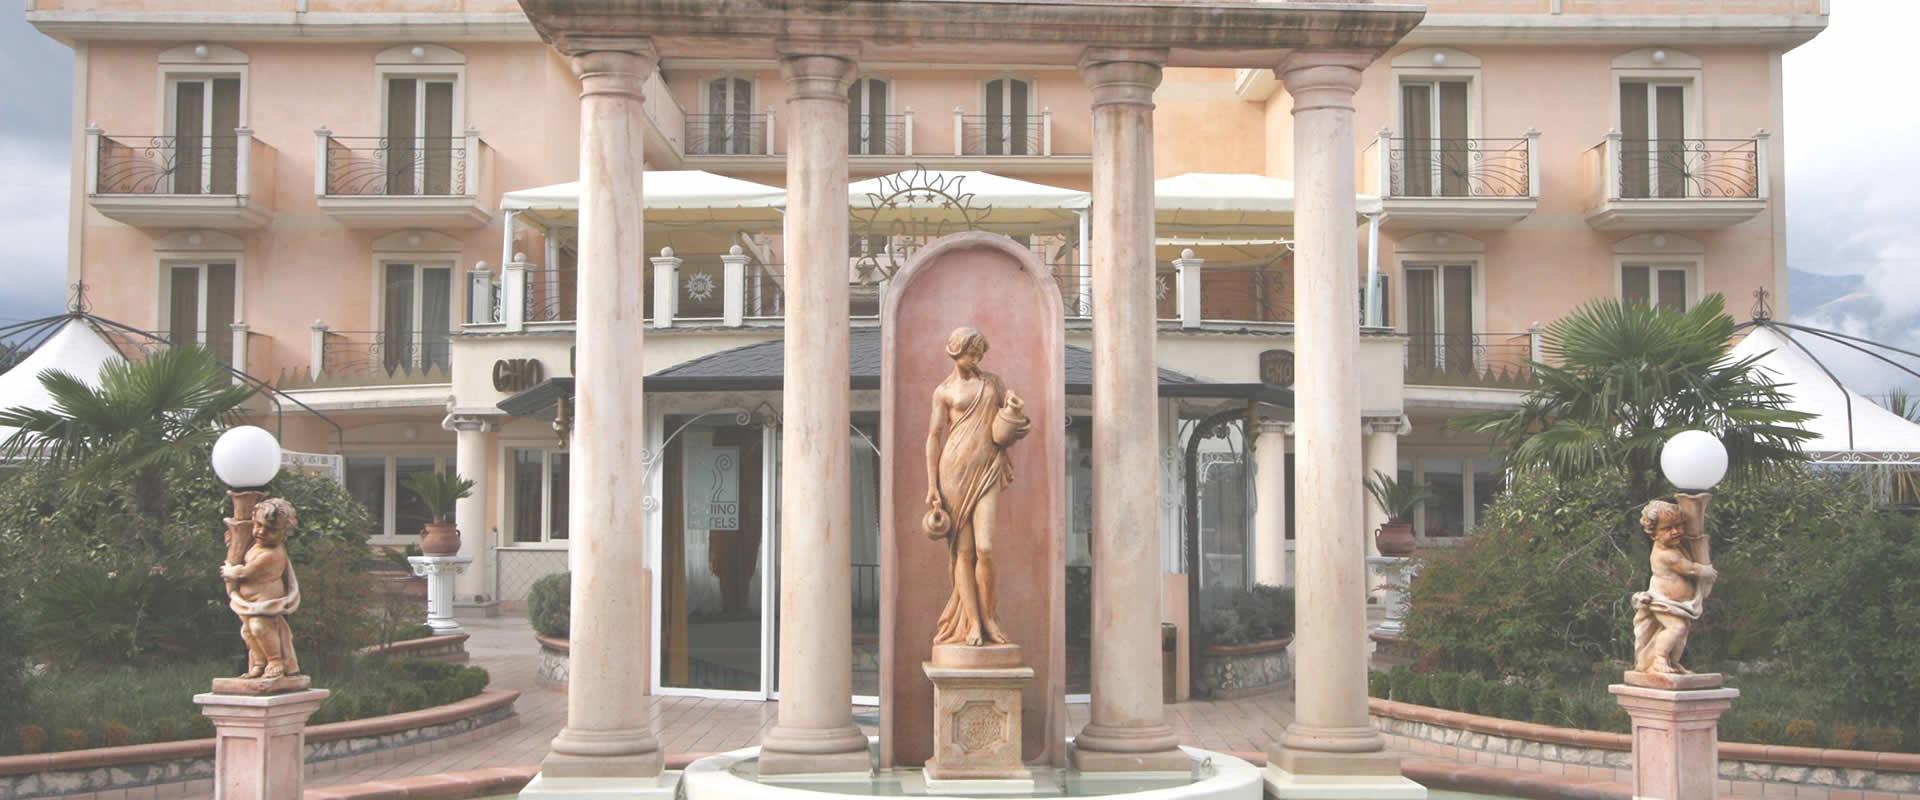 Ingresso esterno Grand Hotel OSman